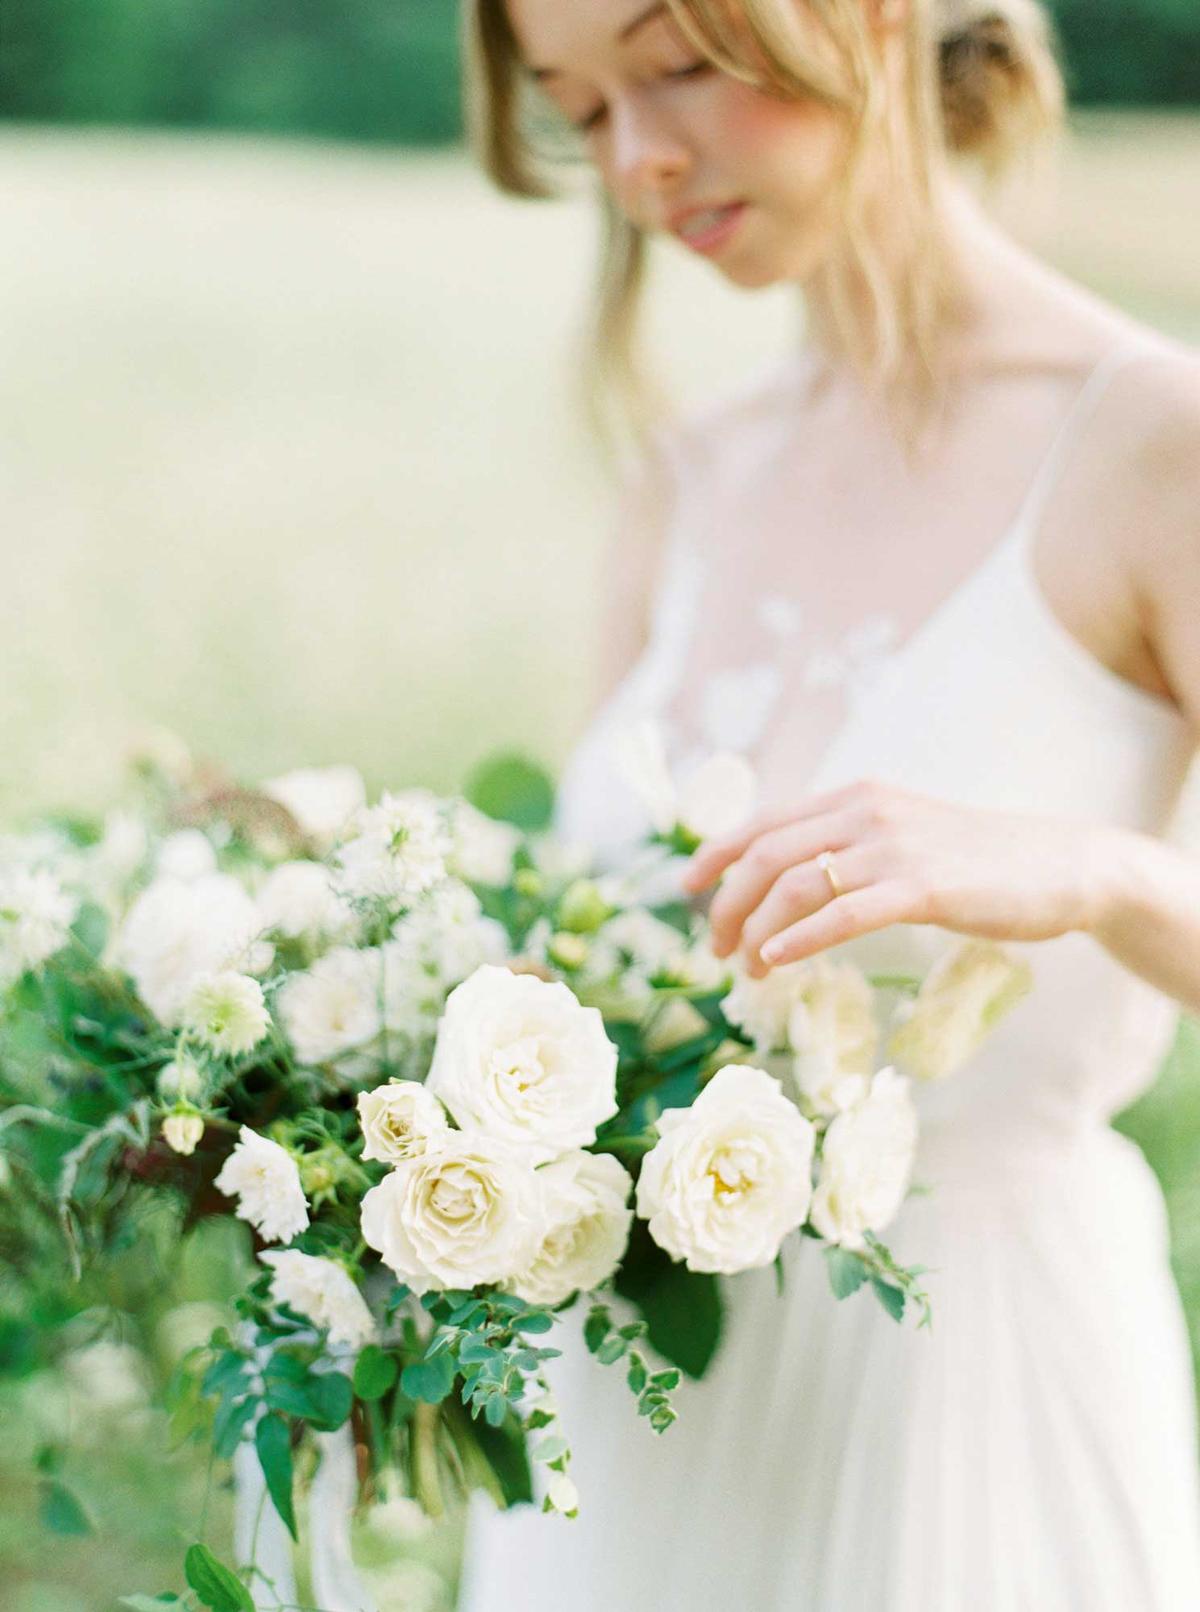 kayla-yestal-vineyard-bride-swish-list-woodland-weddings-niagara-wedding-editorial-43.jpg